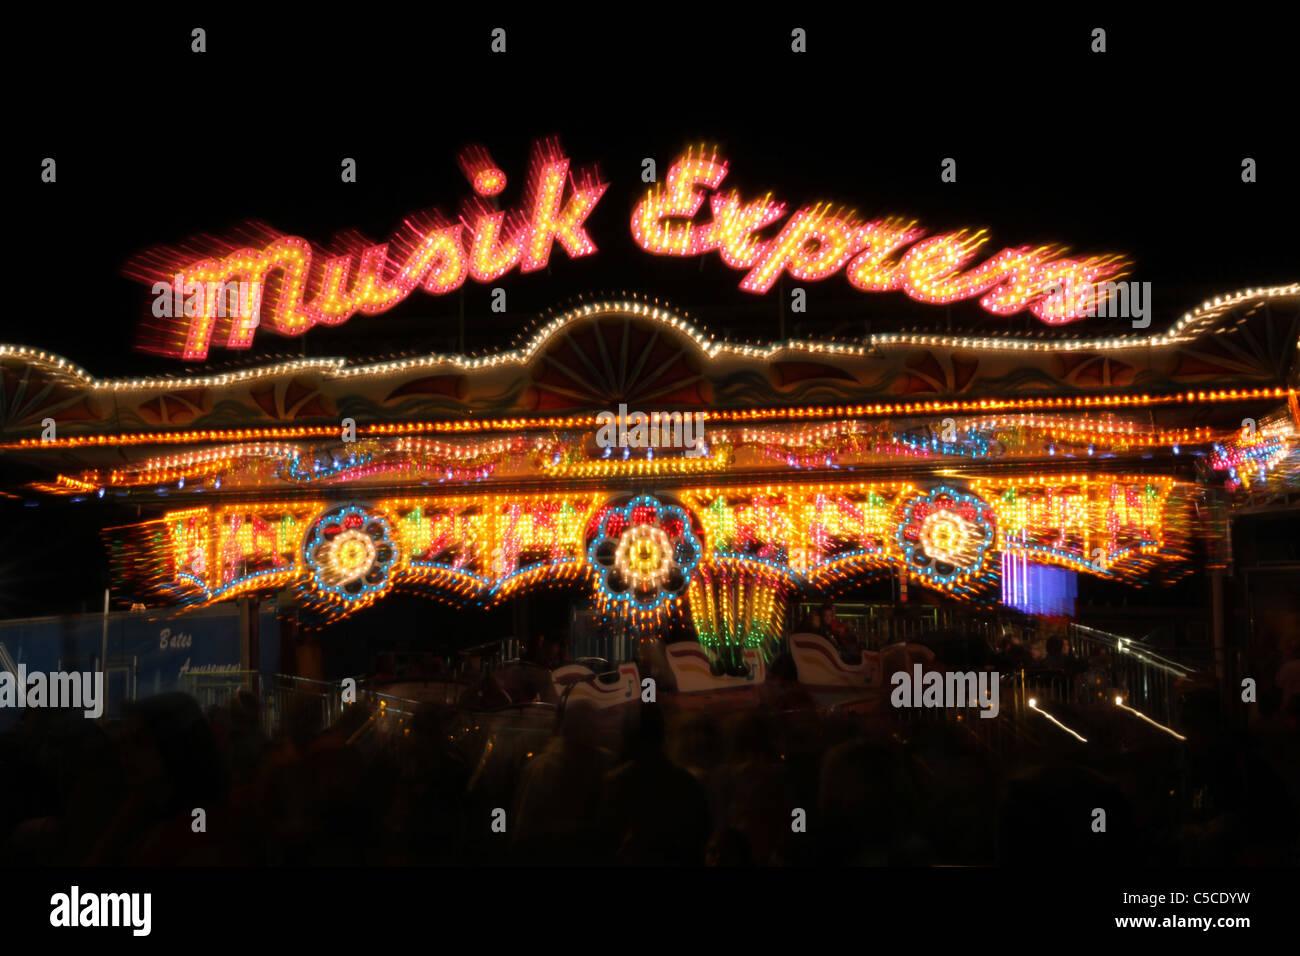 Musik-Express Carnival Ride. Zoom-Objektiv Zoom Effekt während der Belichtung. Canfield Fair. Mahoning County Stockbild